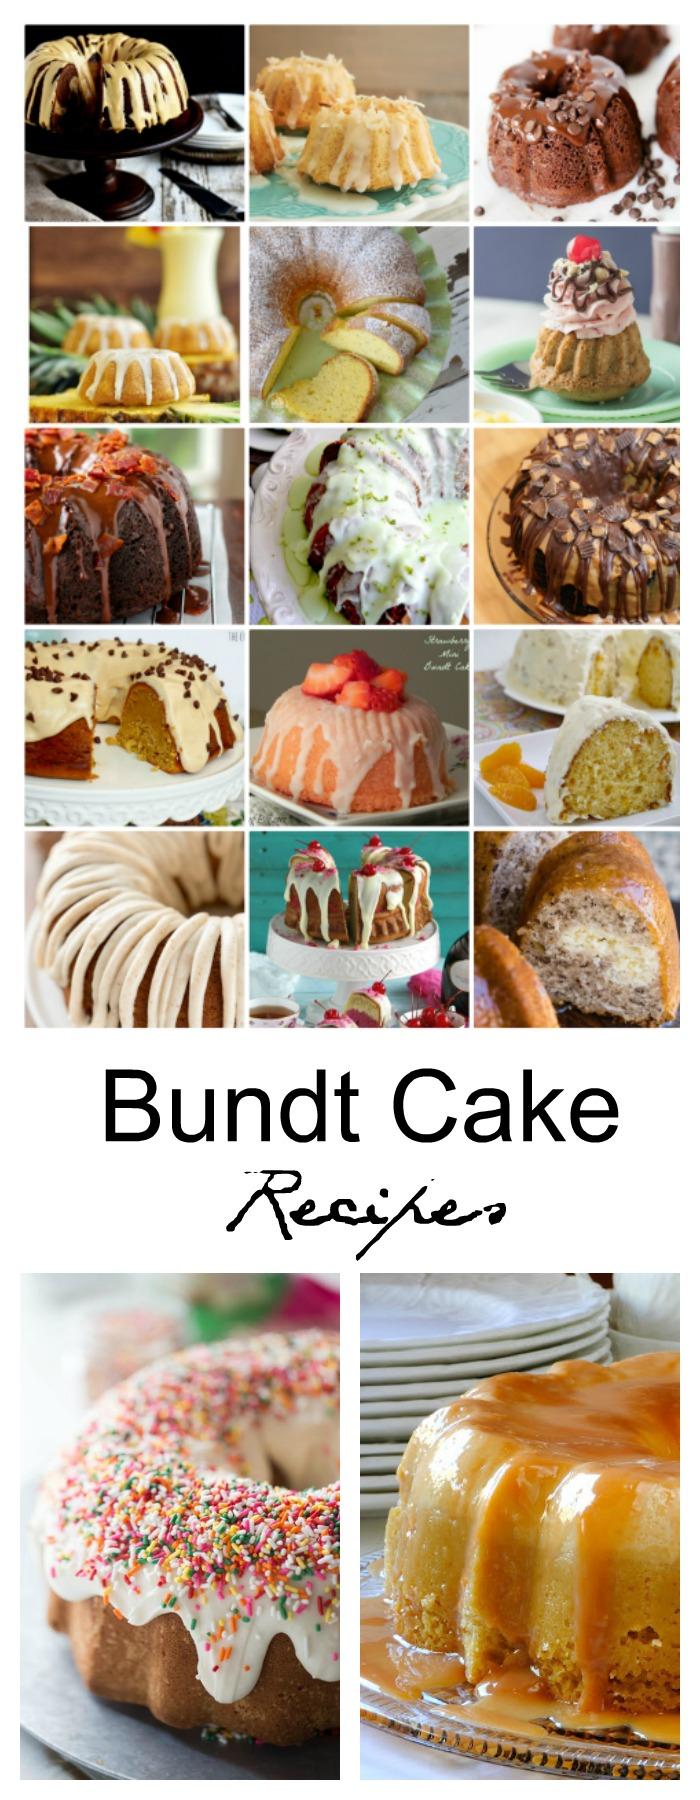 Bundt-Cake-Recipes-Pin